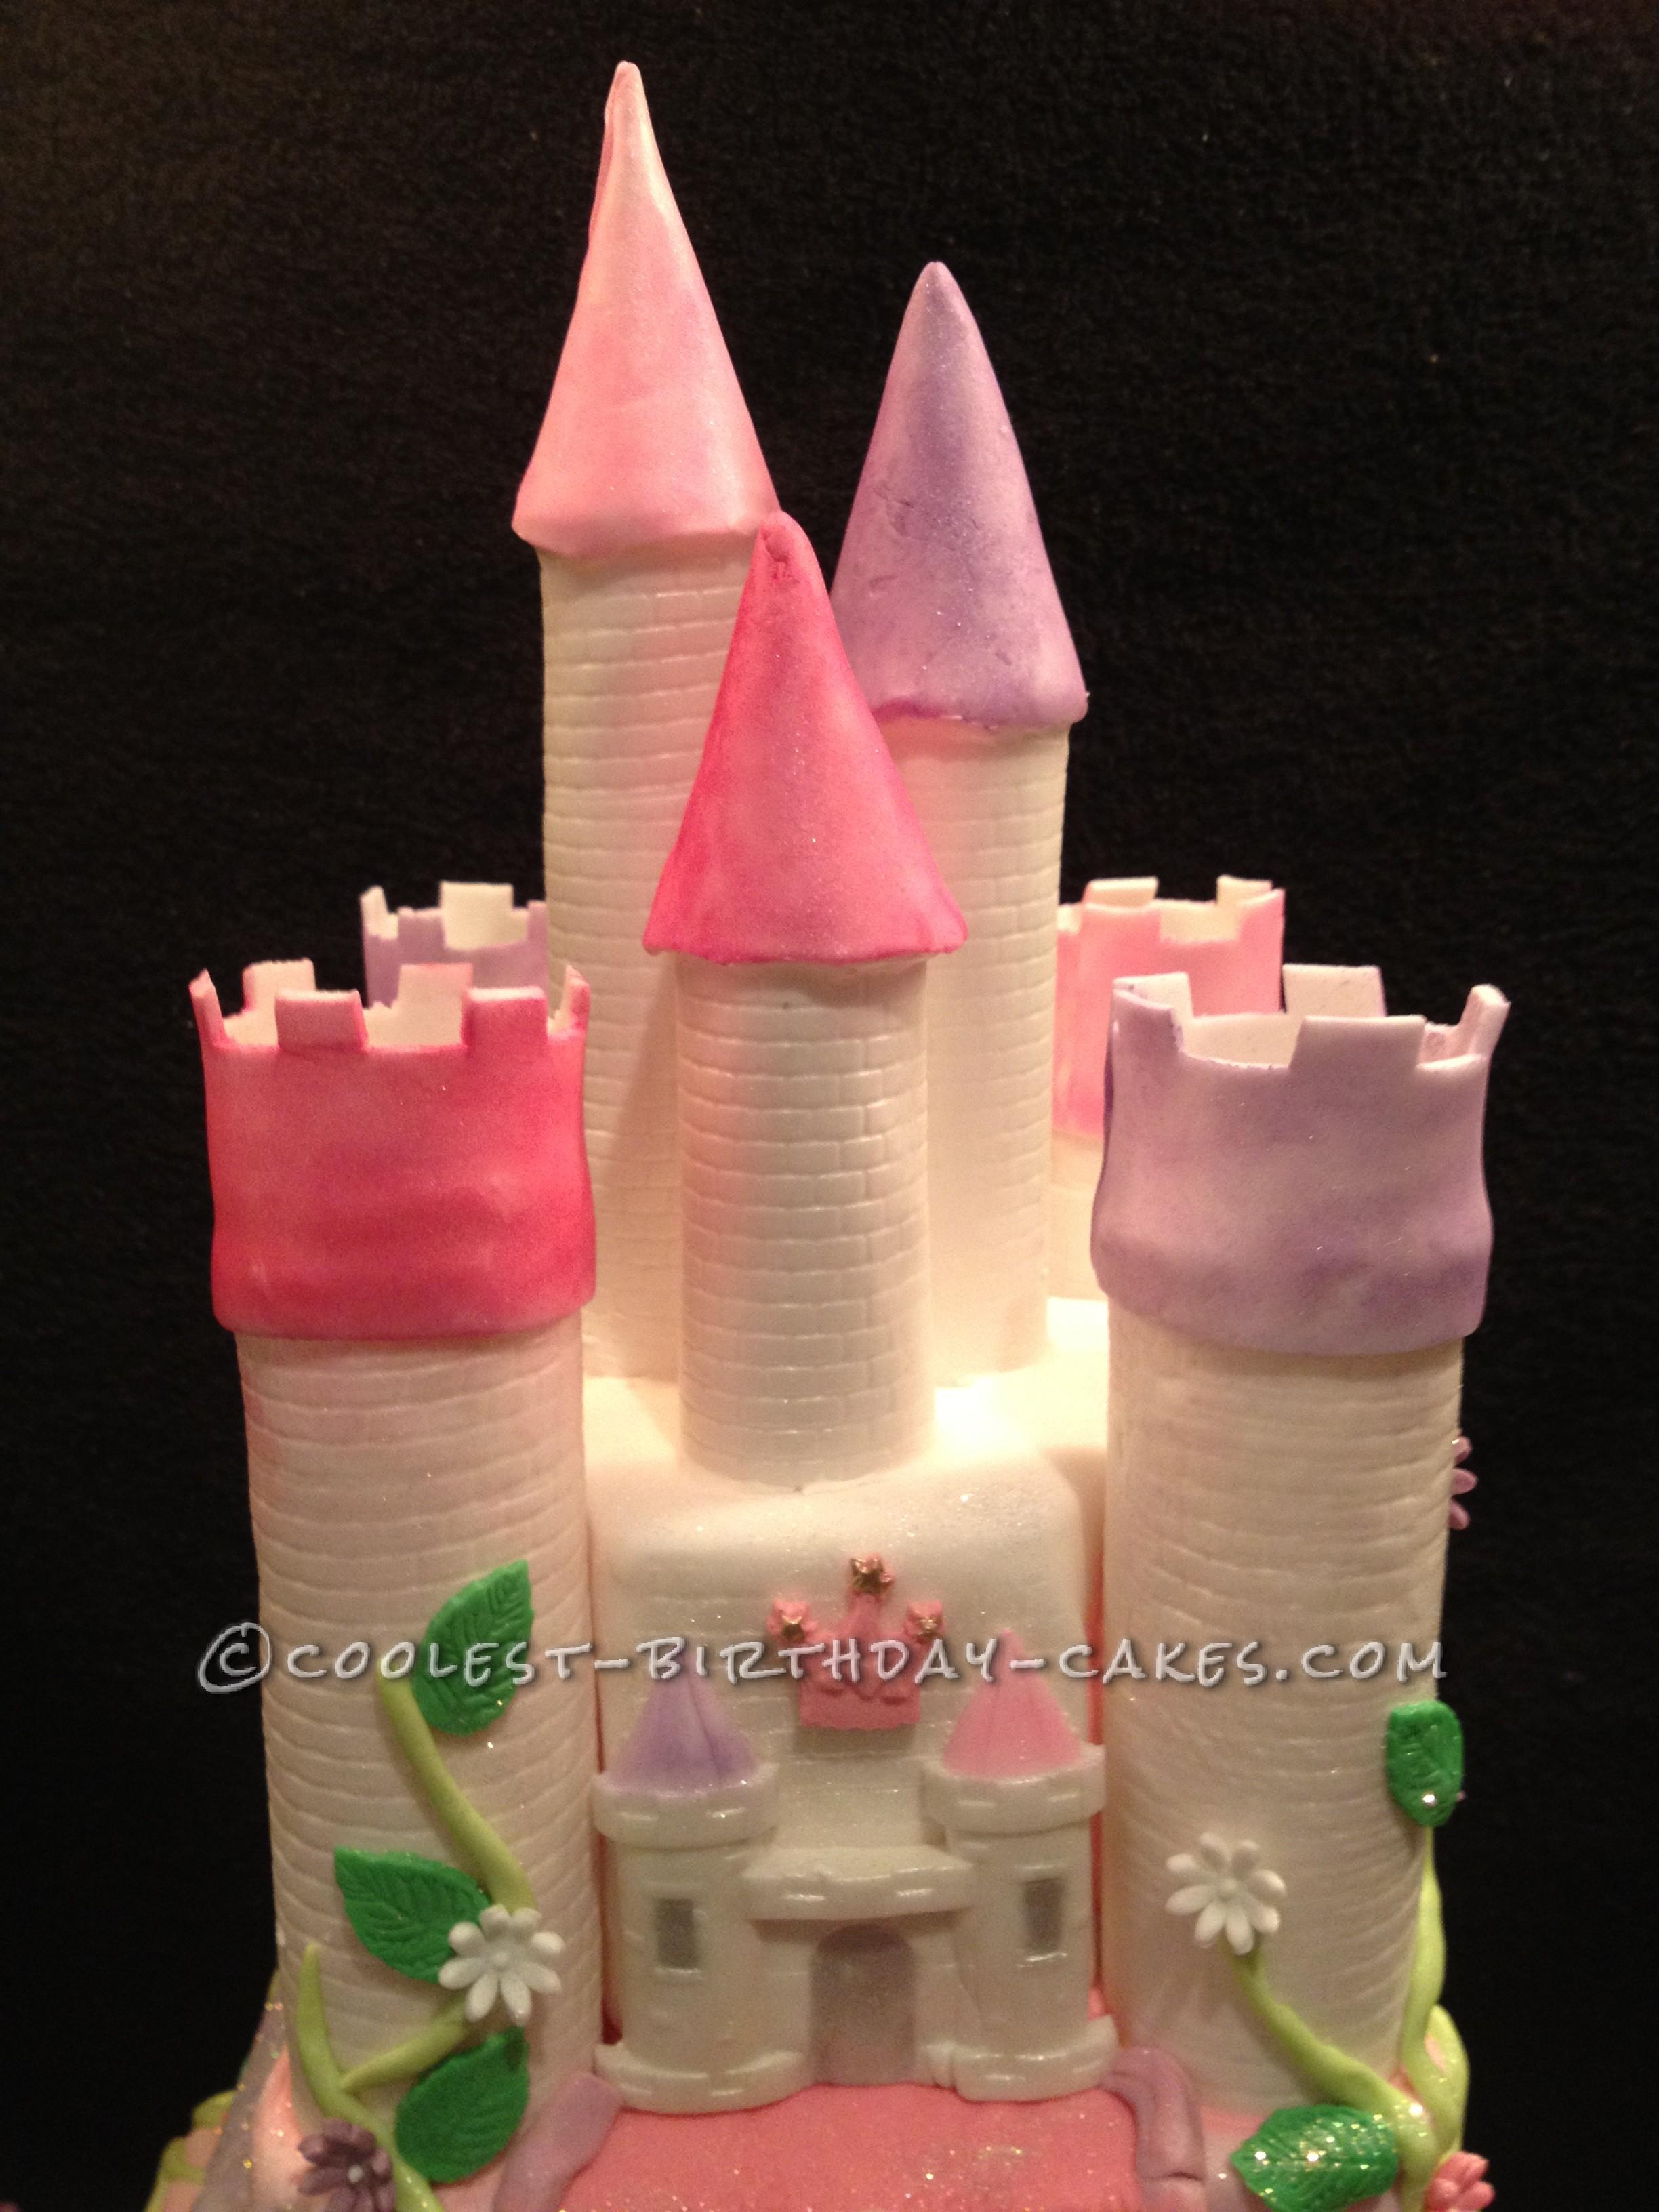 Coolest Snow White and the Seven Dwarfs Castle Cake